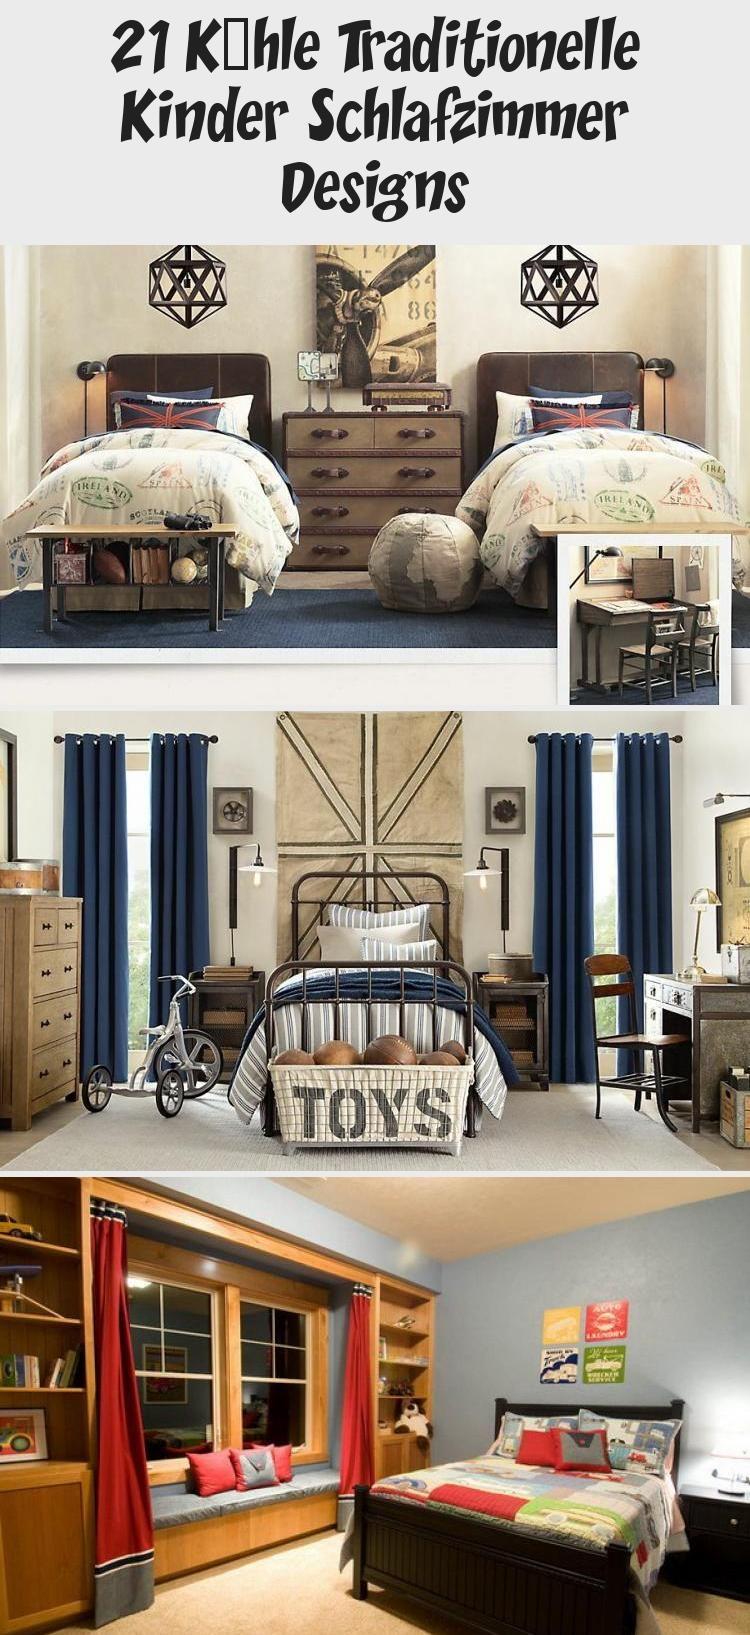 21 Kuhle Traditionelle Kinder Schlafzimmer Designs Decor Home